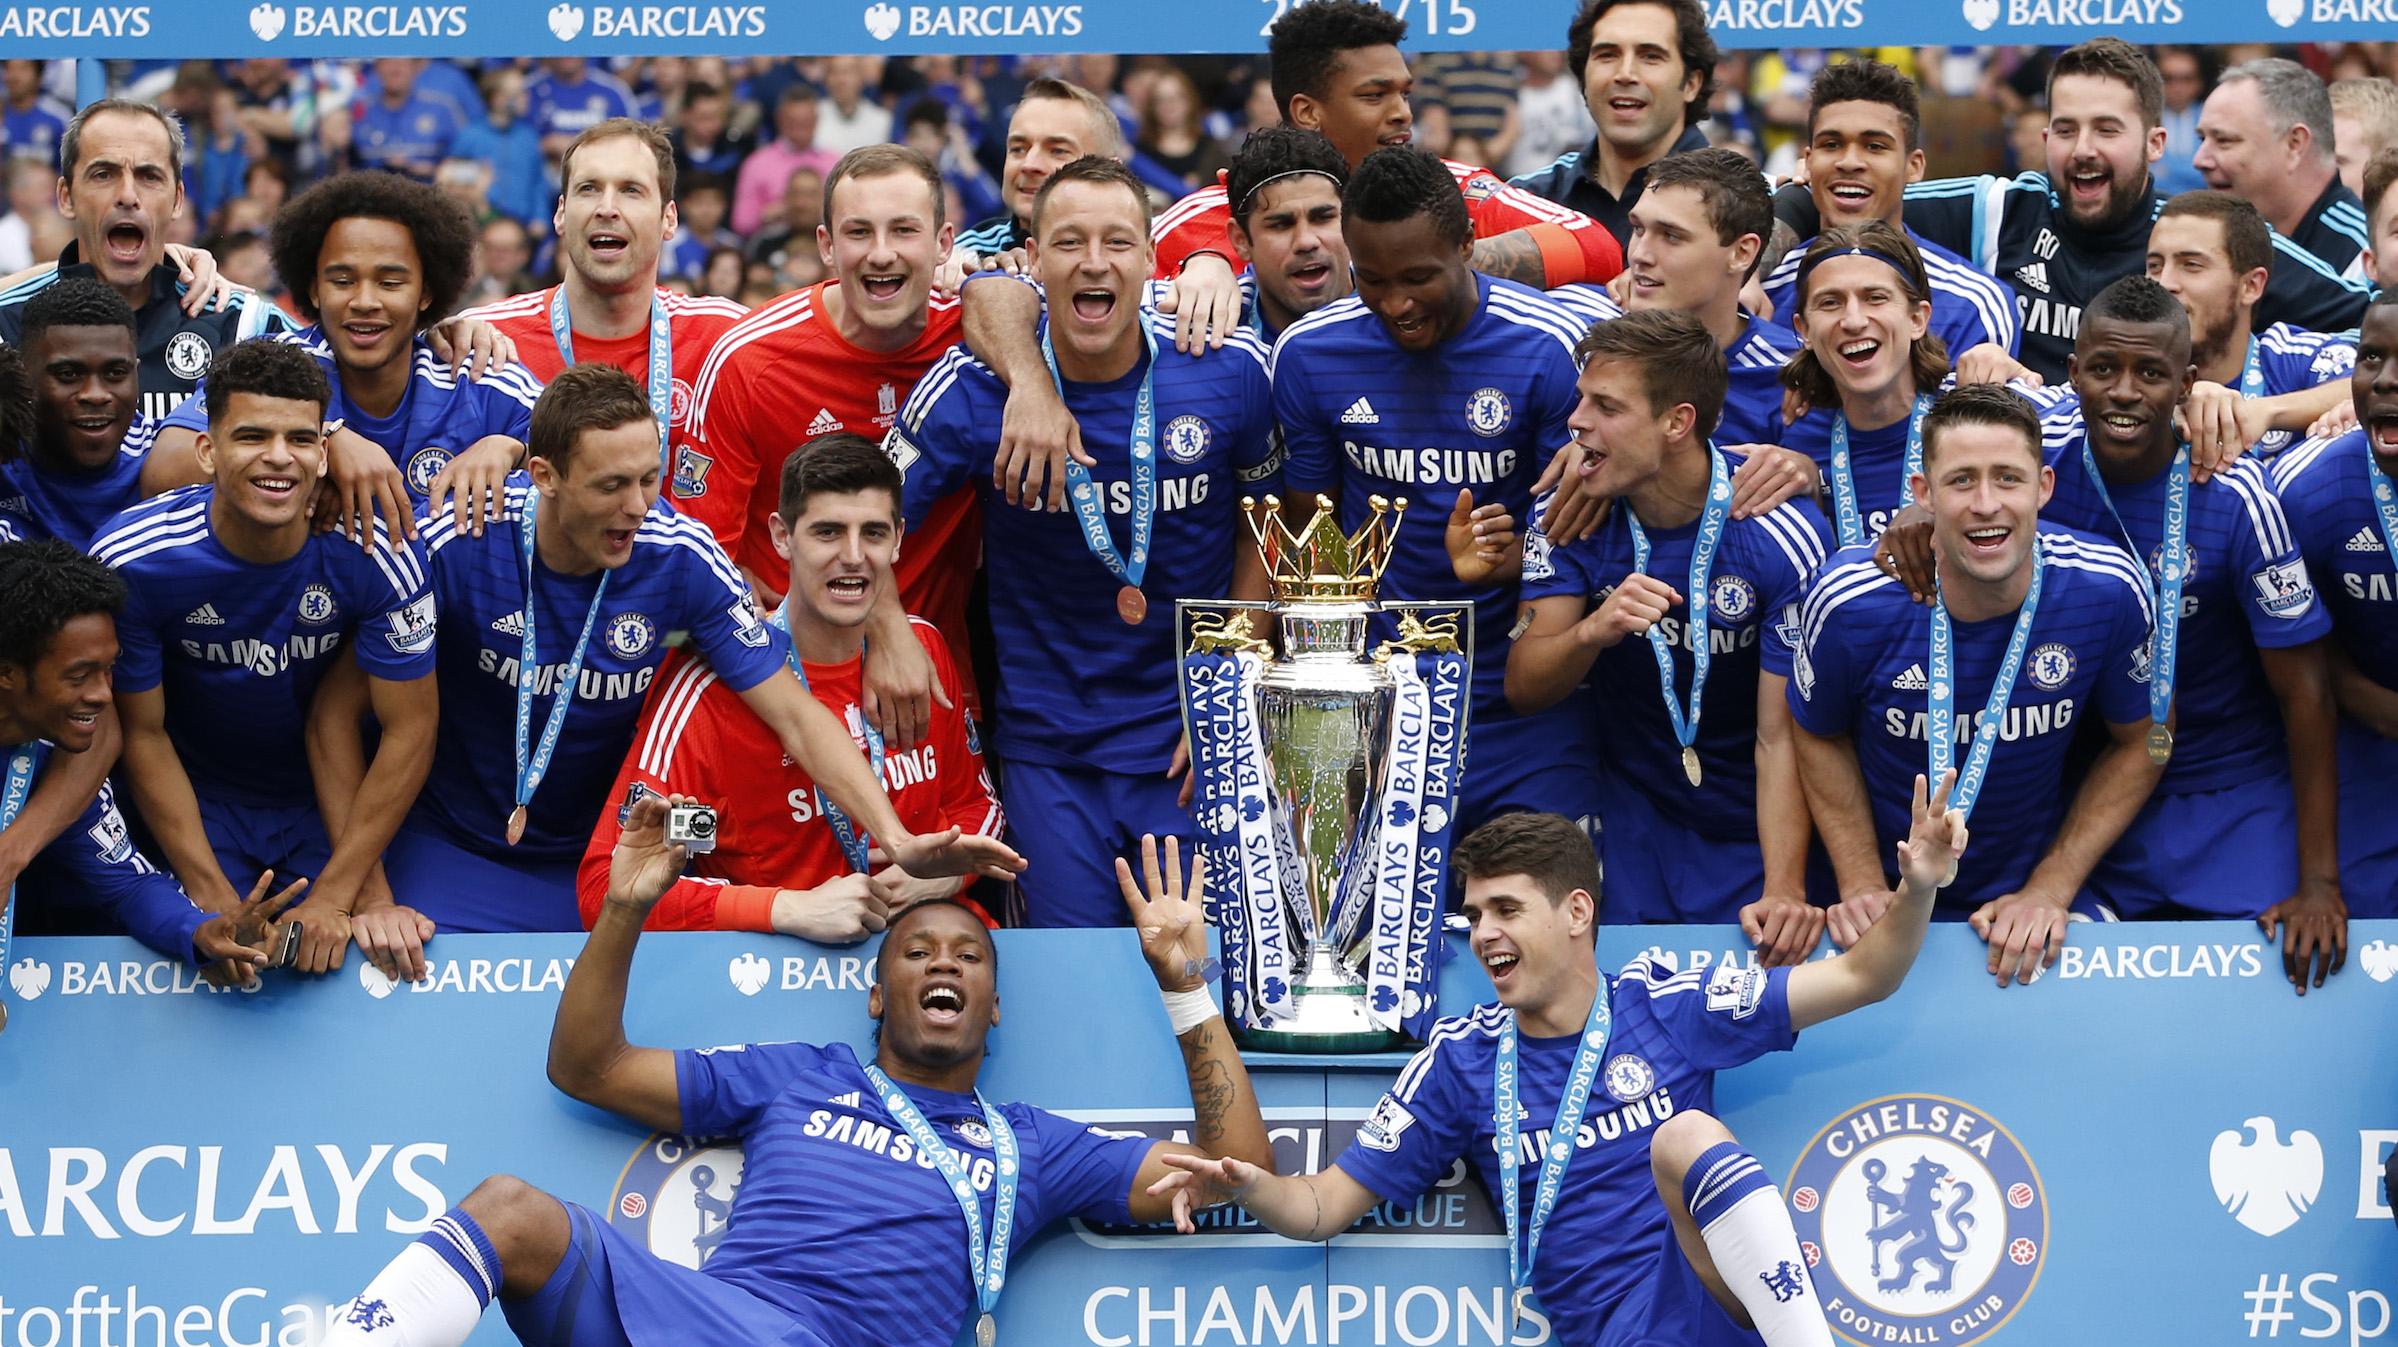 Chelsea celebrates winning Barclays Premier League.